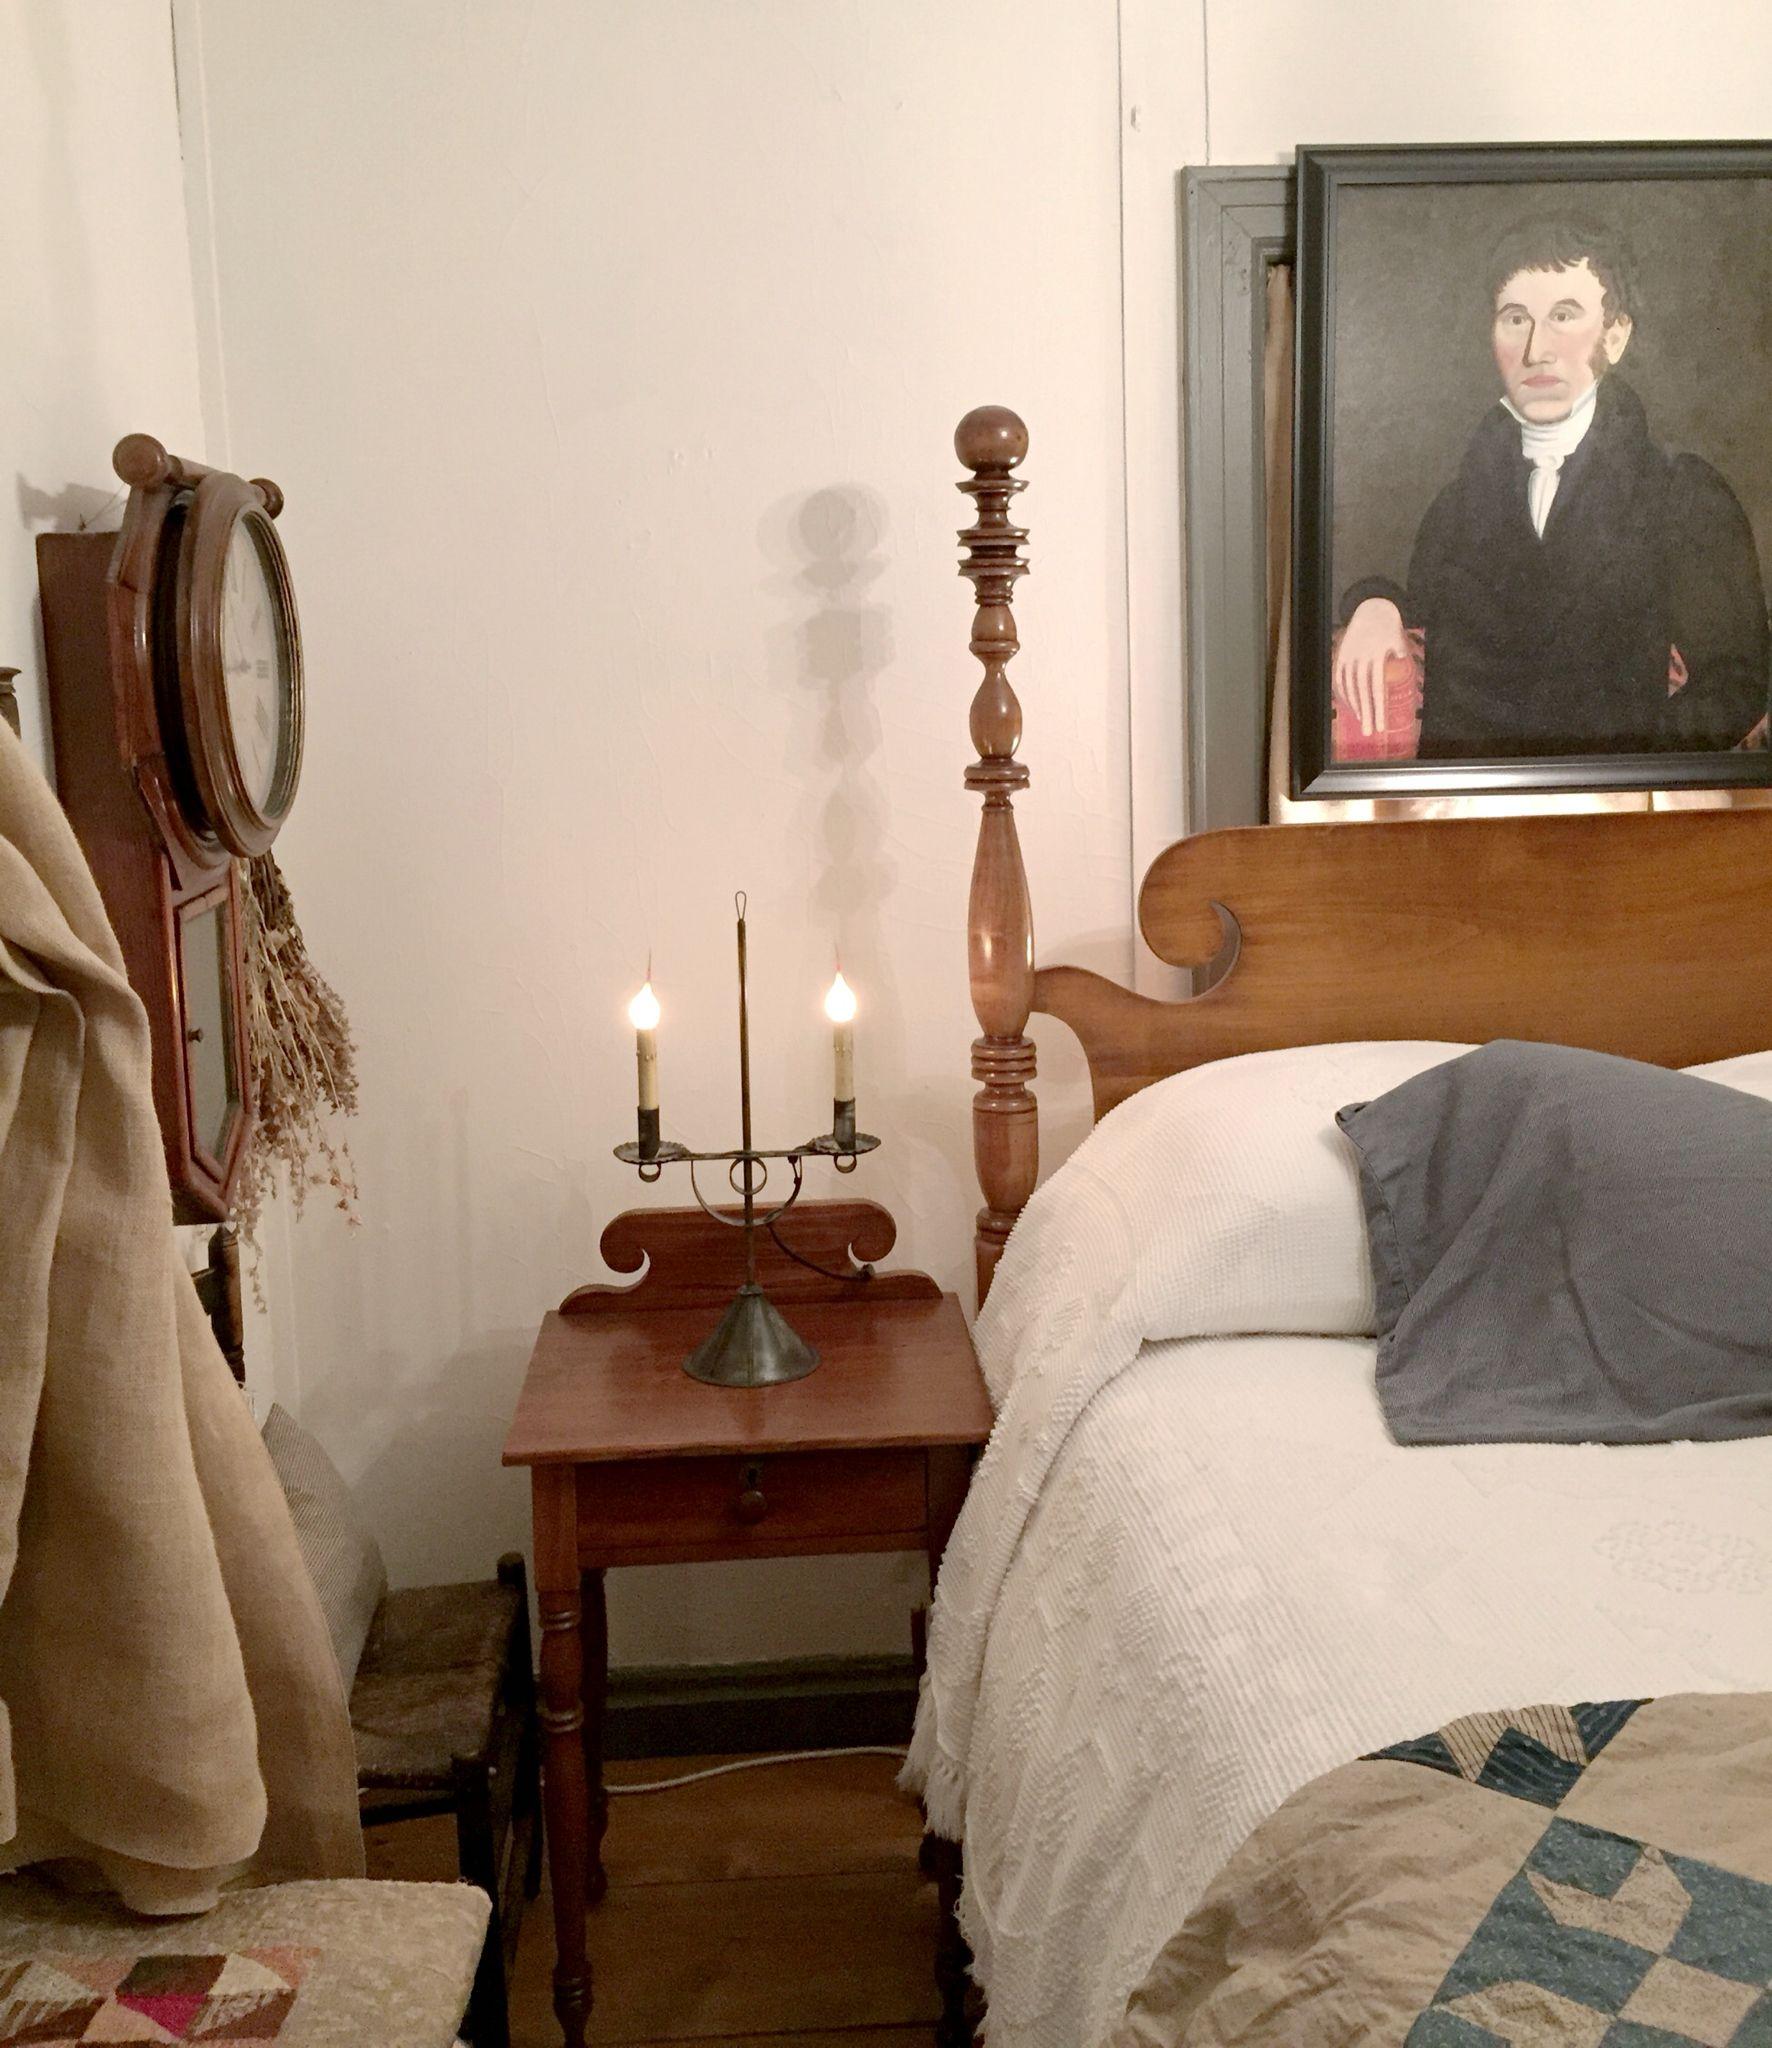 Primitive Bedroom Furniture Colonial Decor Primitive Farmhouse Decor Antiques Beds Furniture